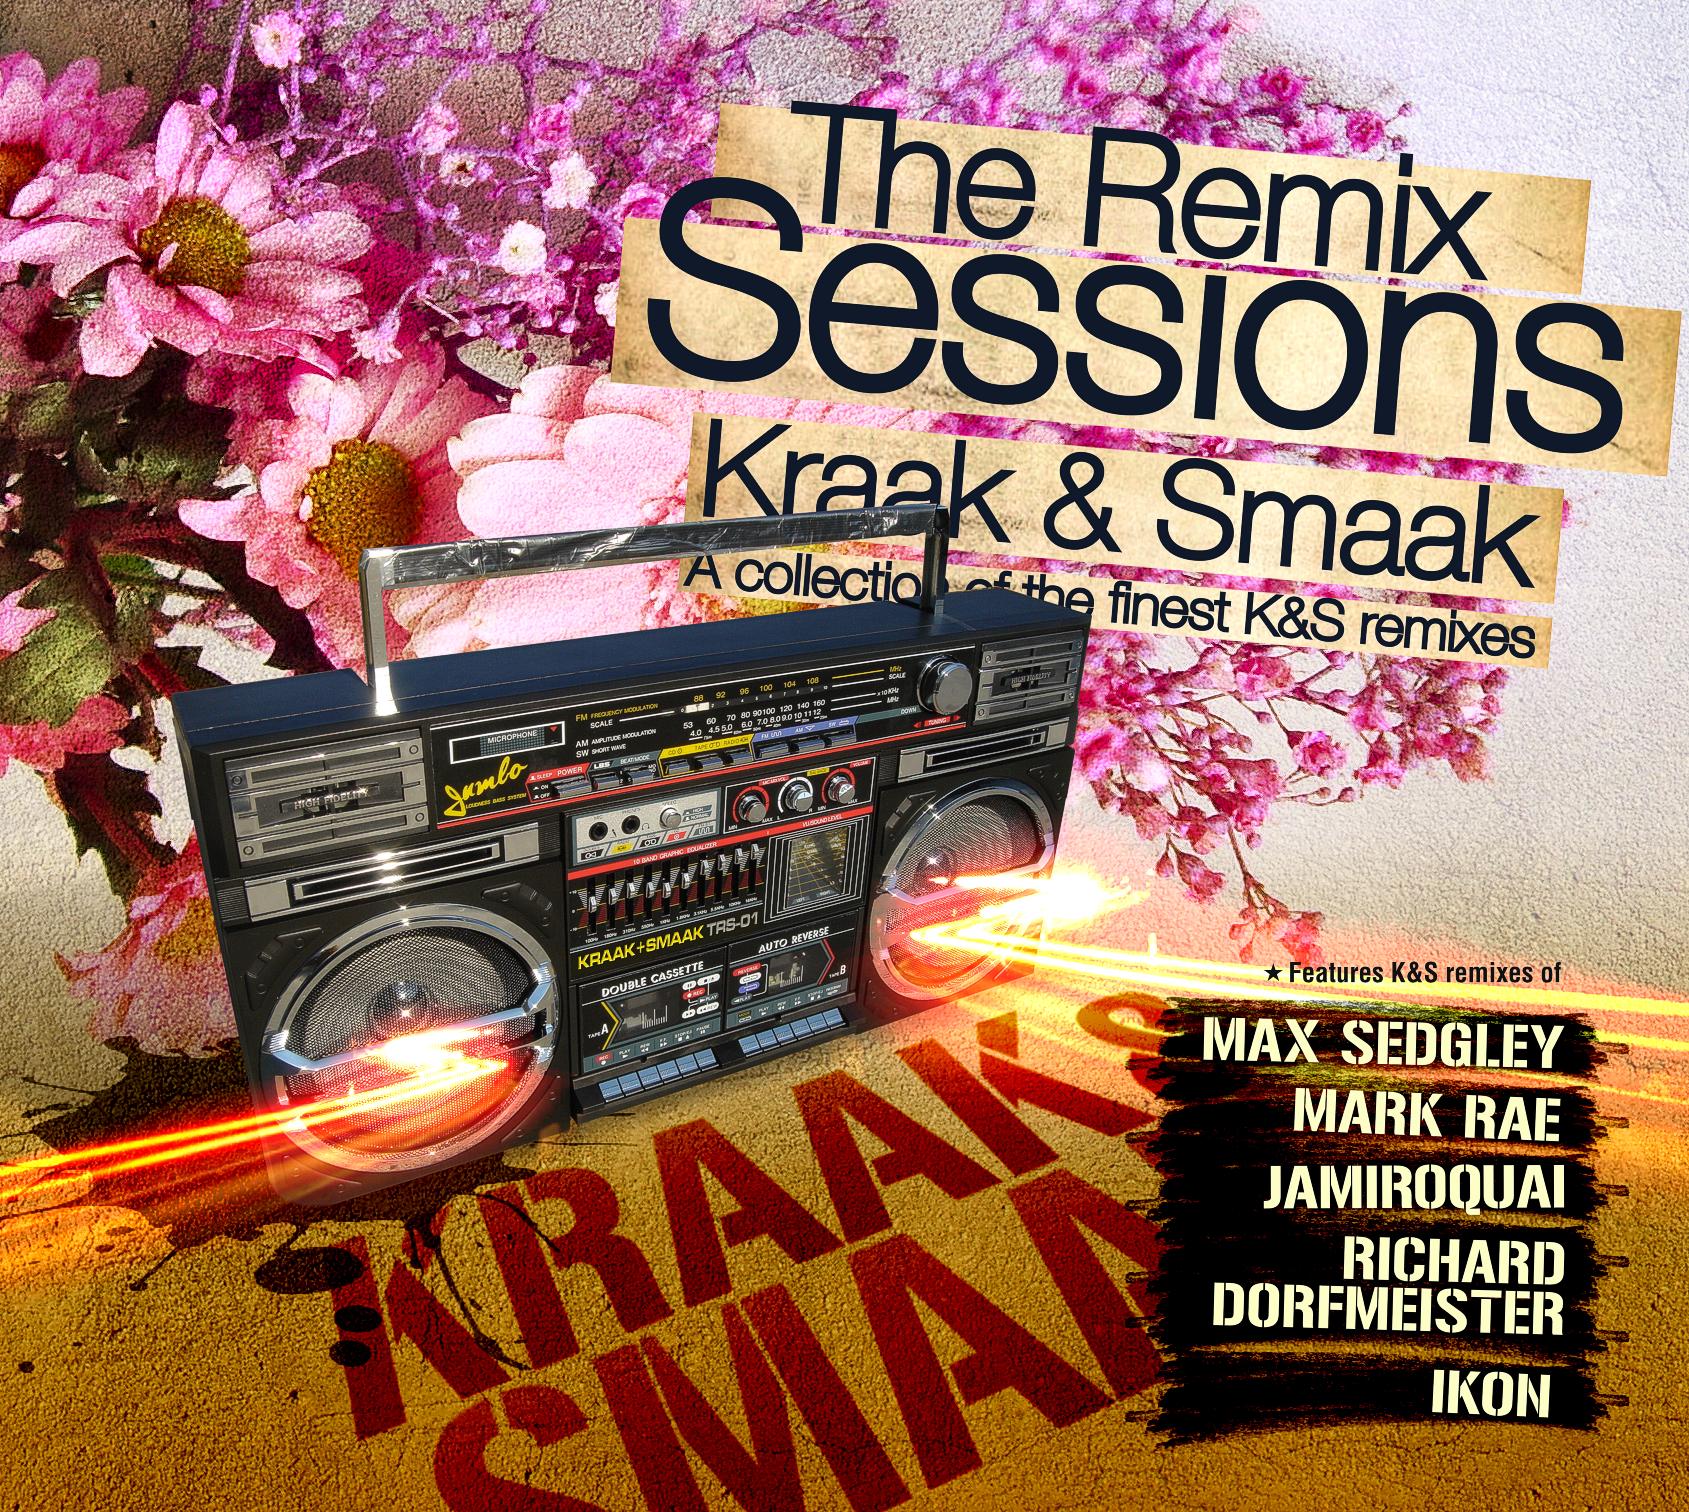 KraakSmaak_RemixSessions.jpg